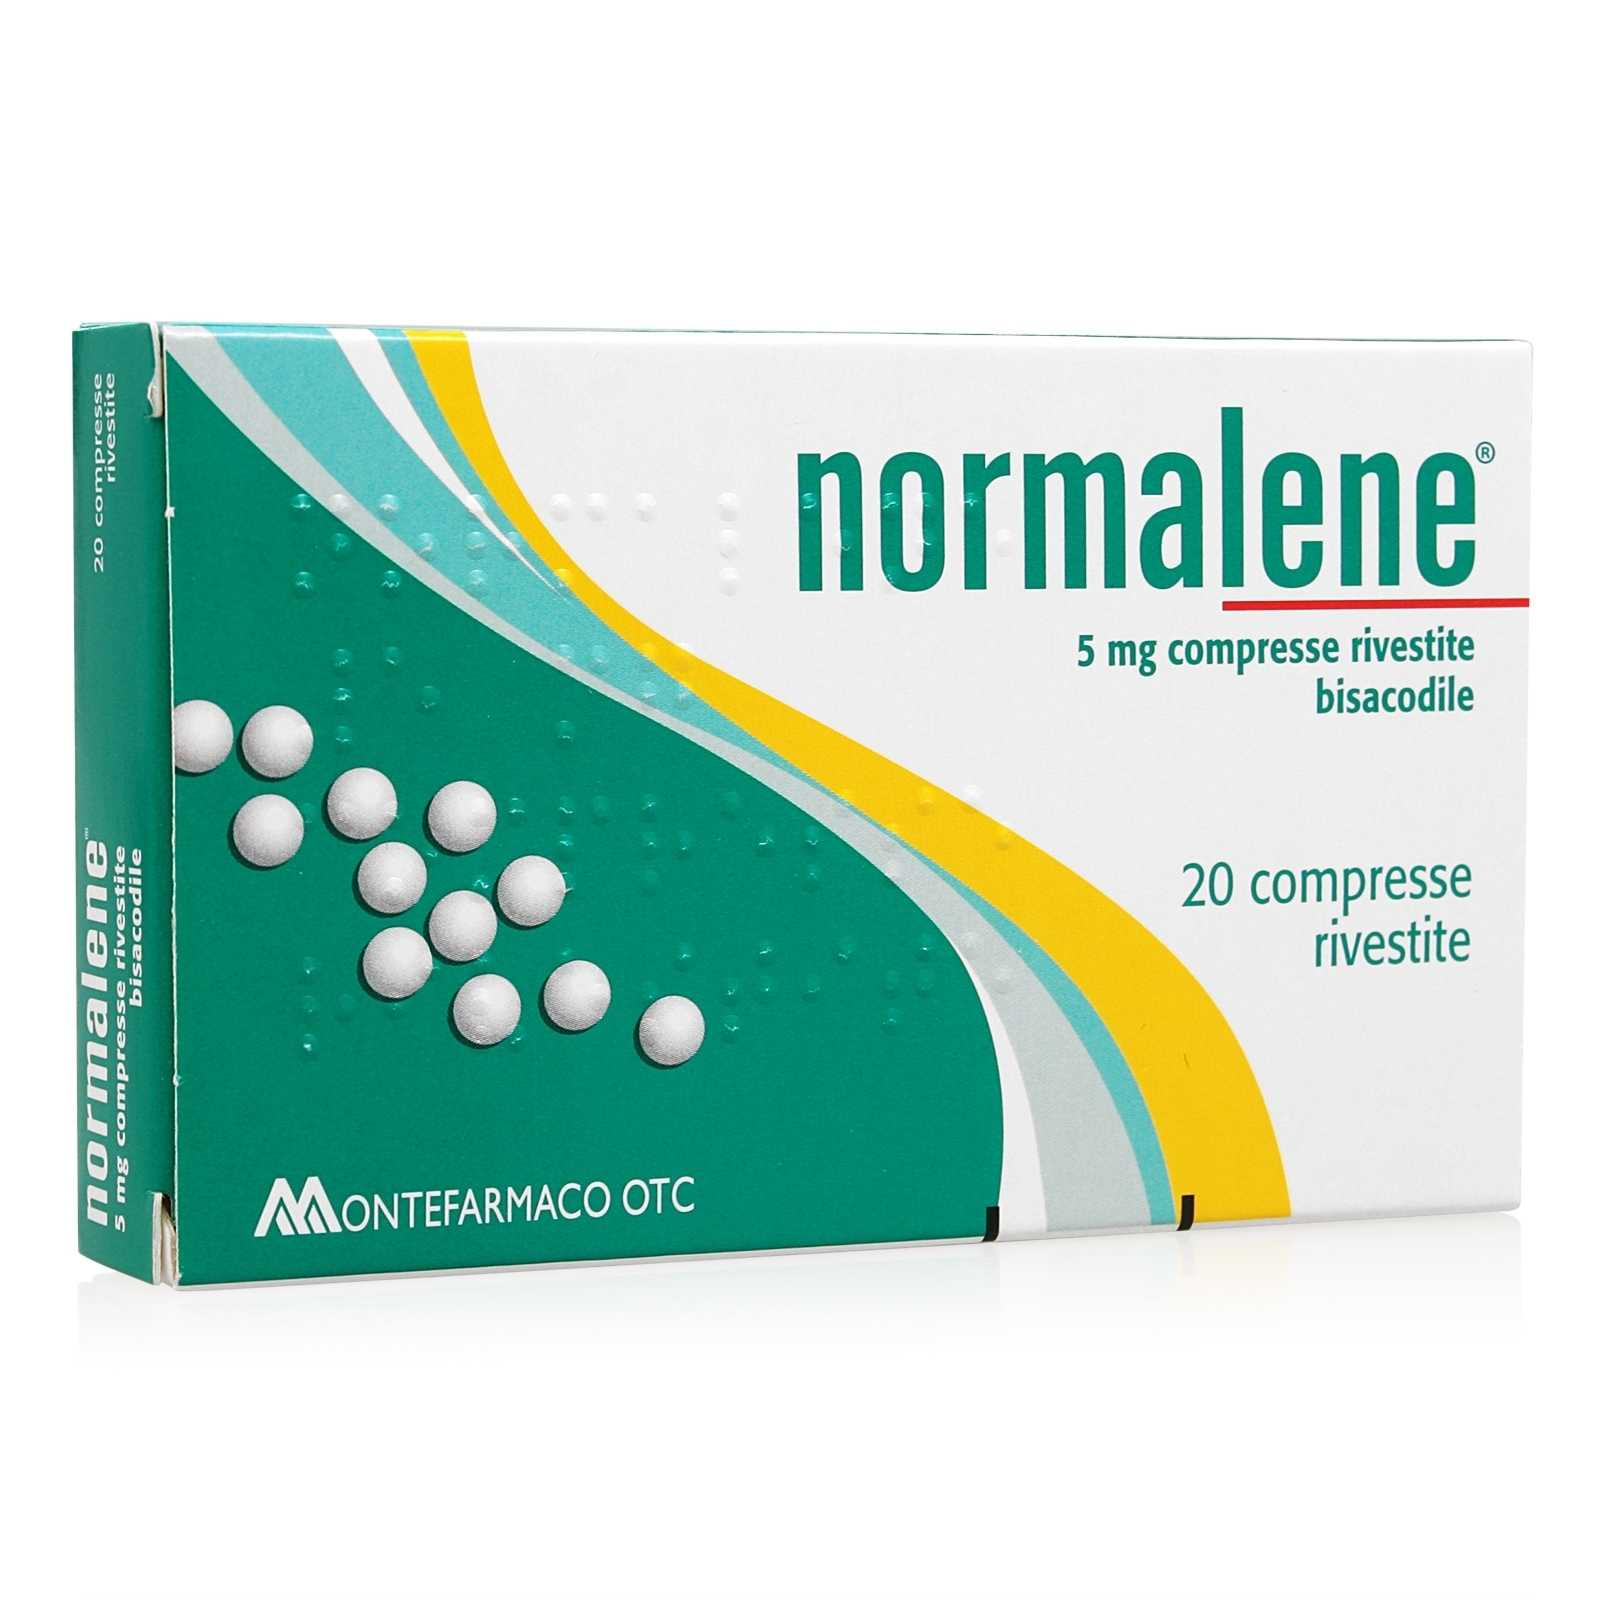 Normalene - Compresse